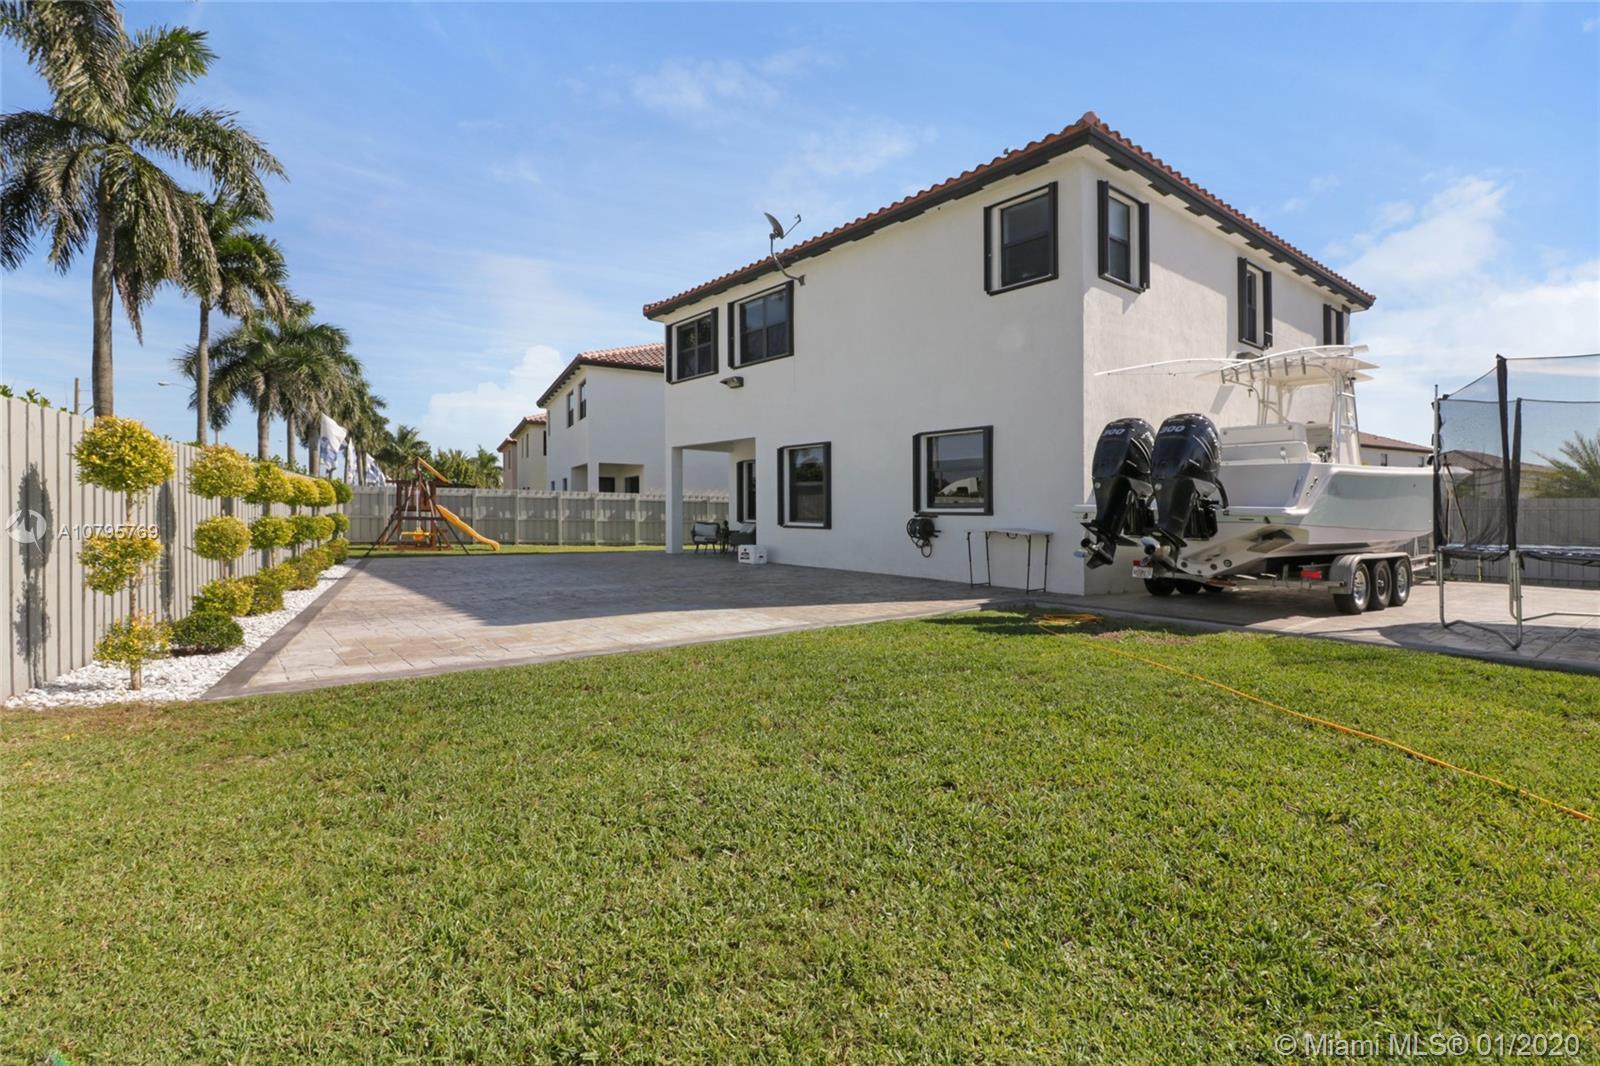 11791 SW 248th Ter, Homestead, FL 33032 - Homestead, FL real estate listing